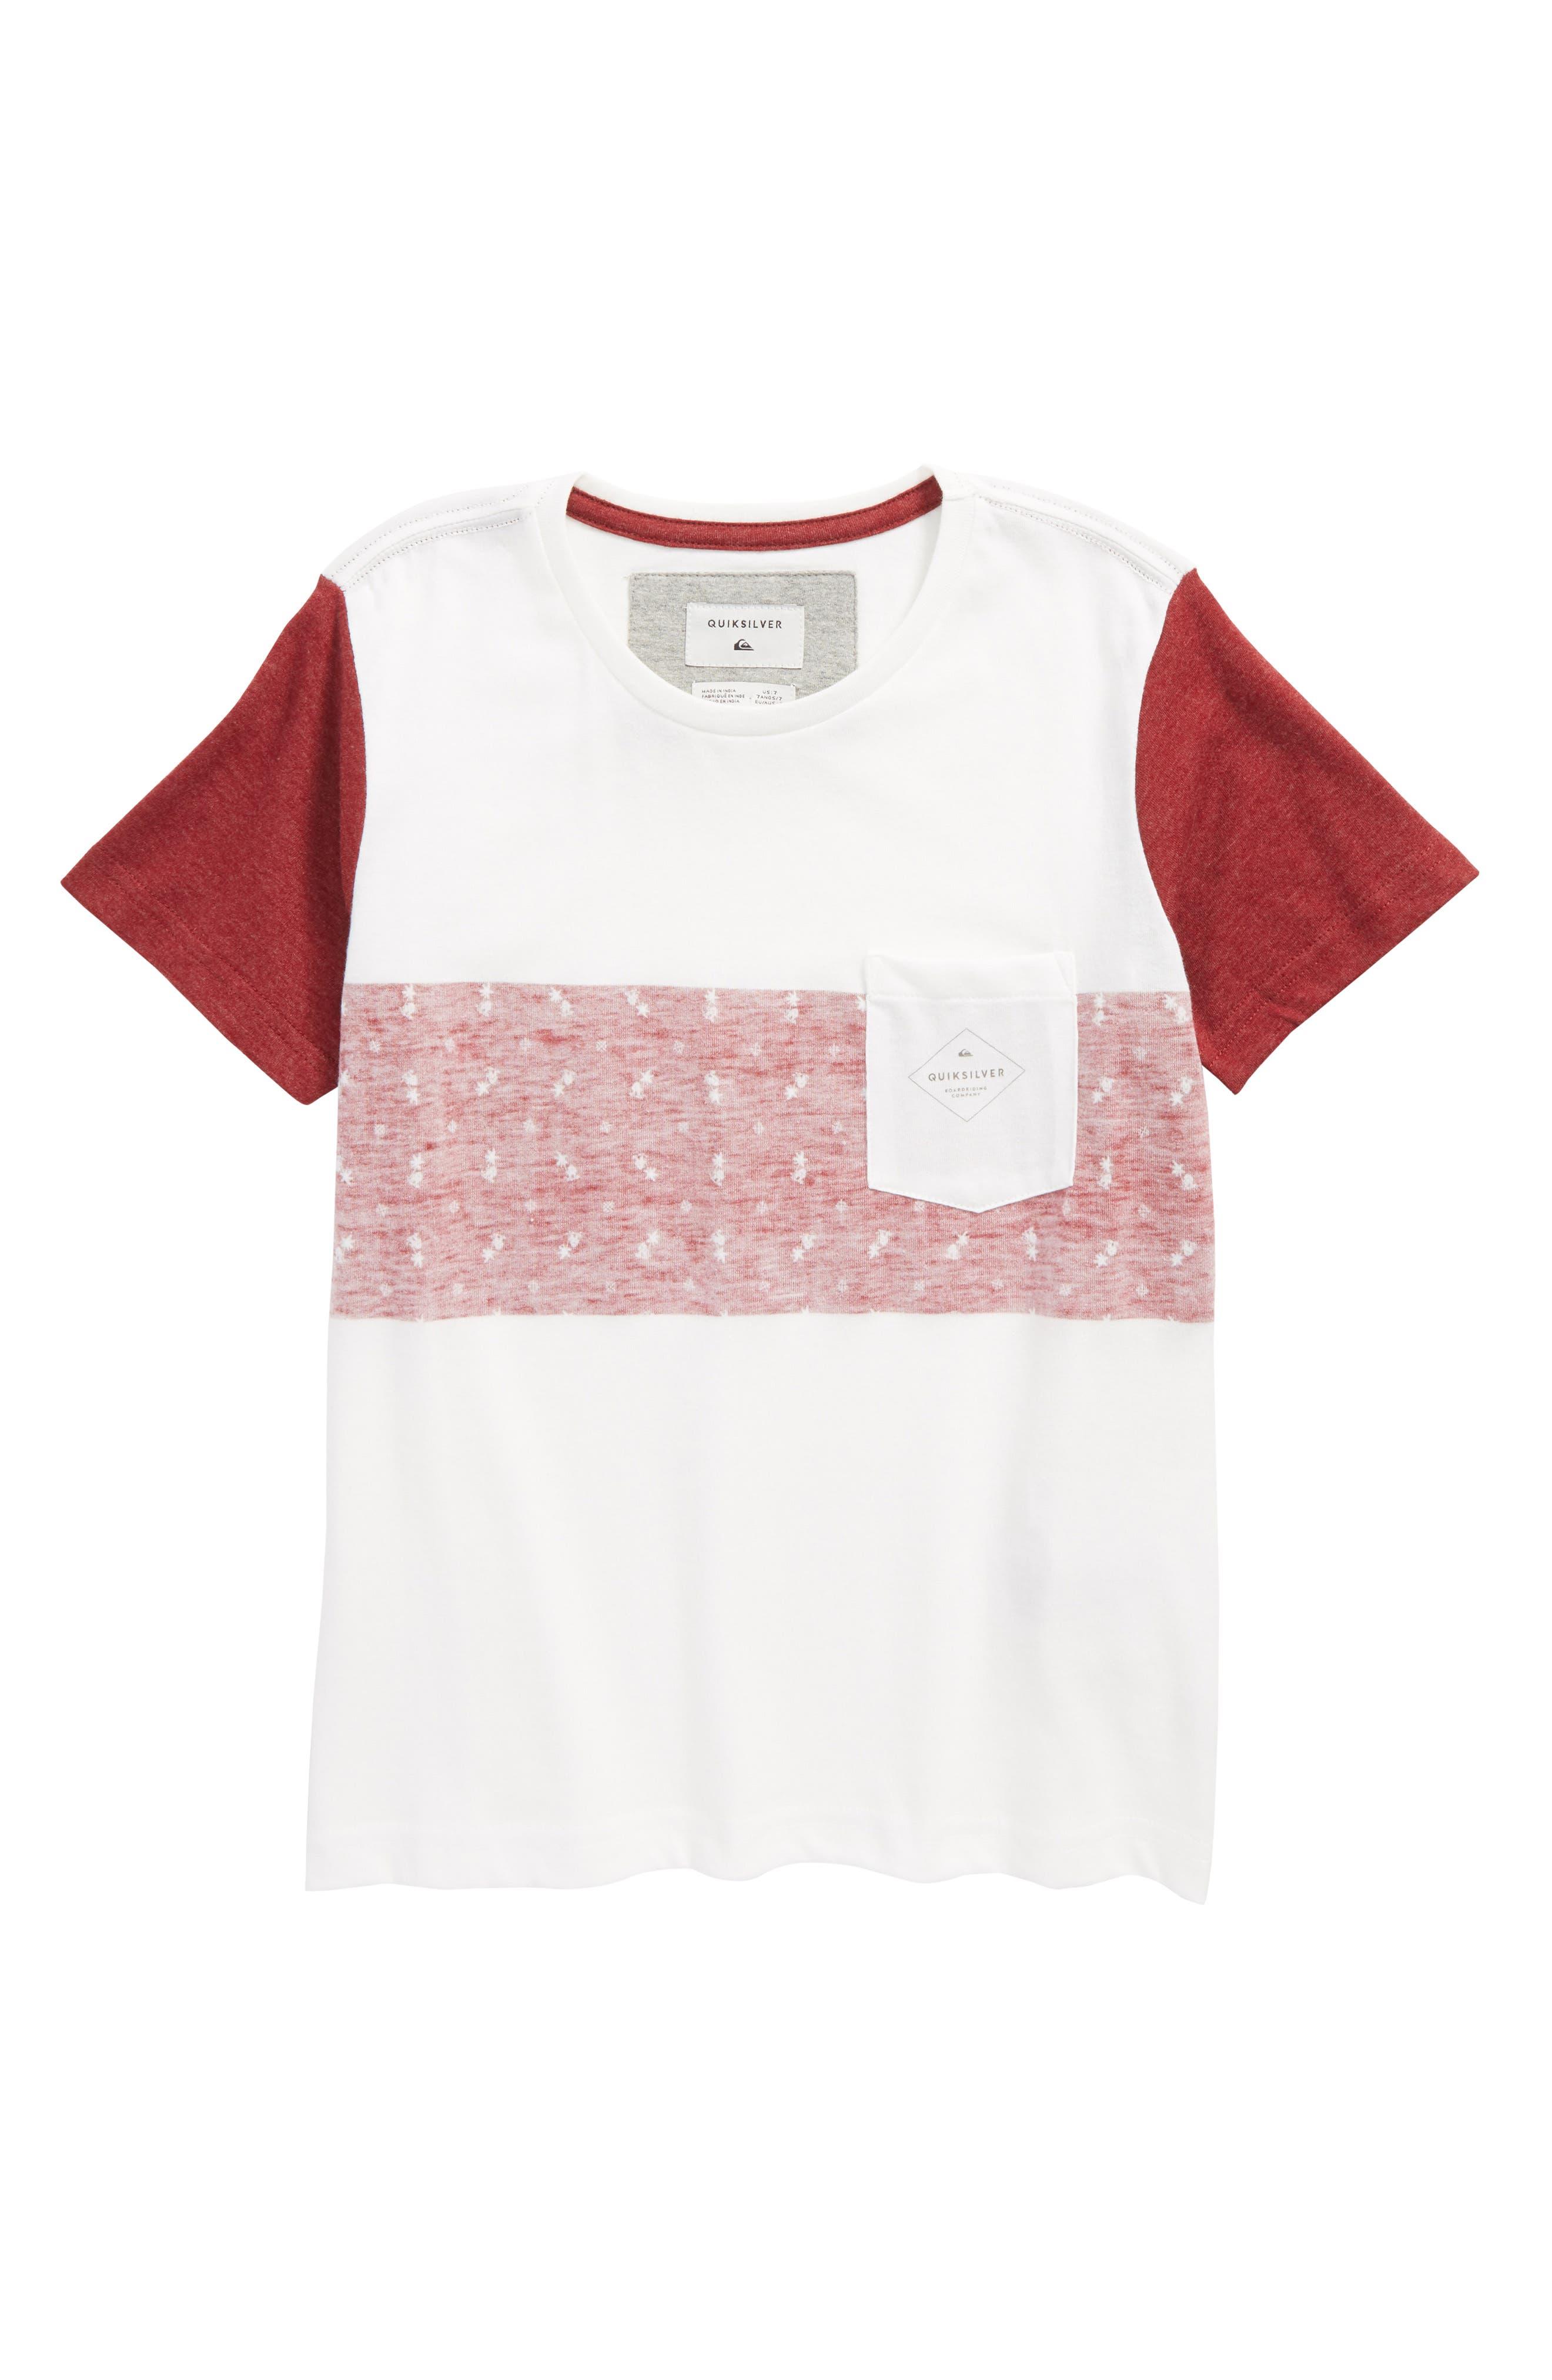 Main Image - Quiksilver Pogwa T-Shirt (Toddler Boys & Little Boys)